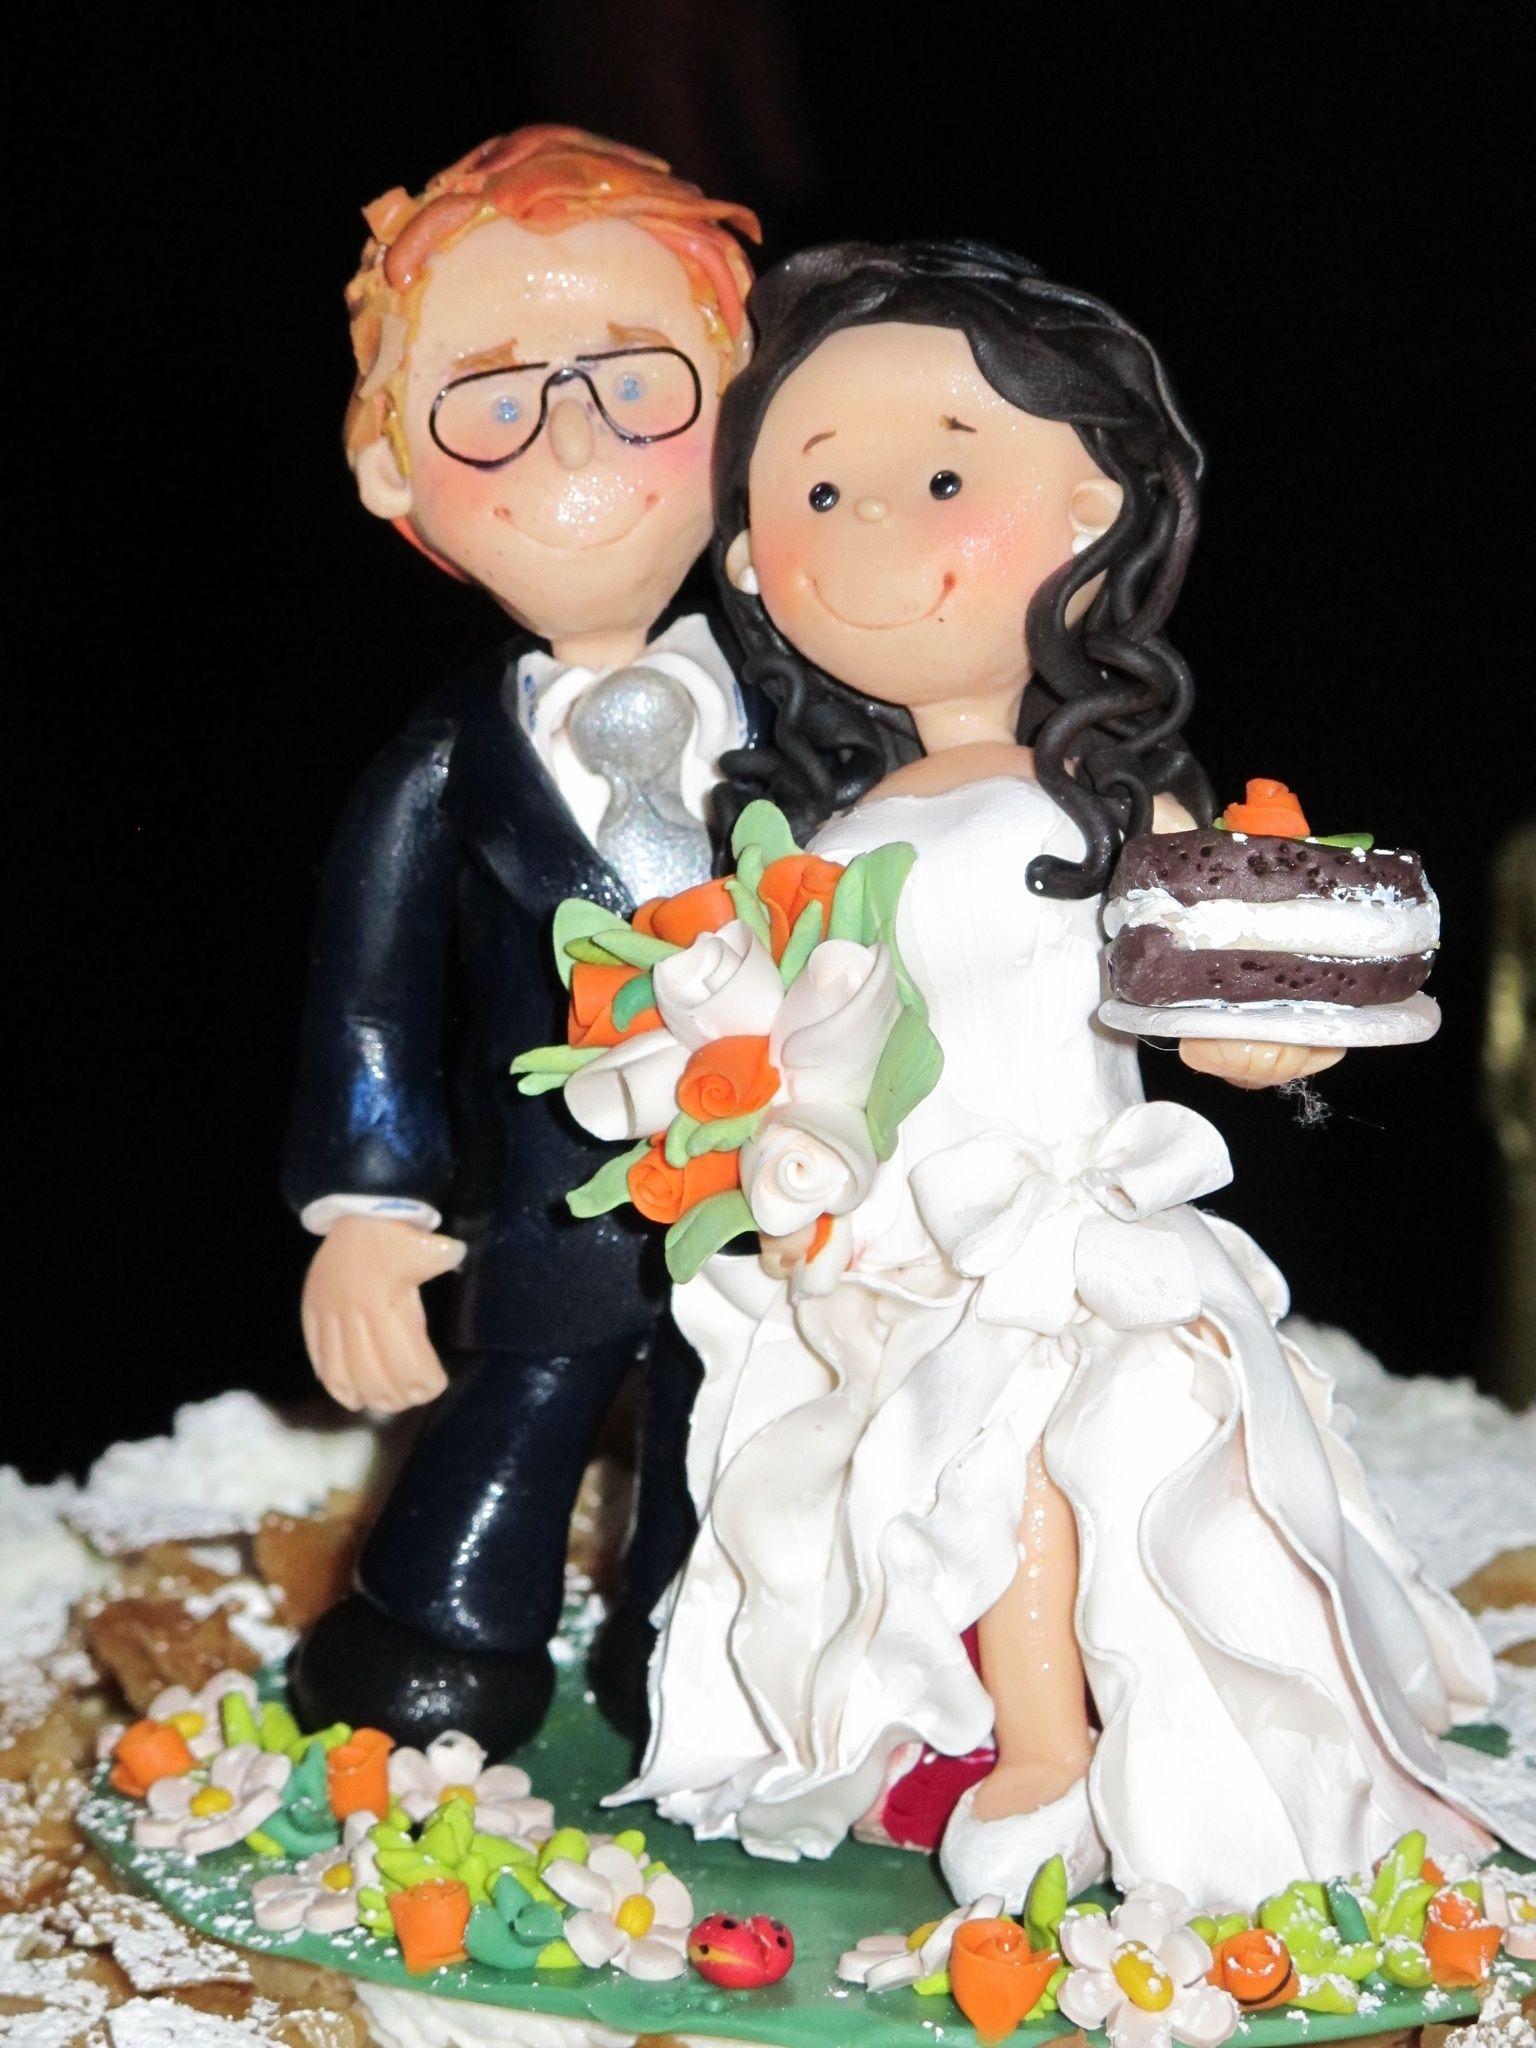 Peaches geldof wedding dress  My custom wedding cake topper  Favorites  Pinterest  Custom